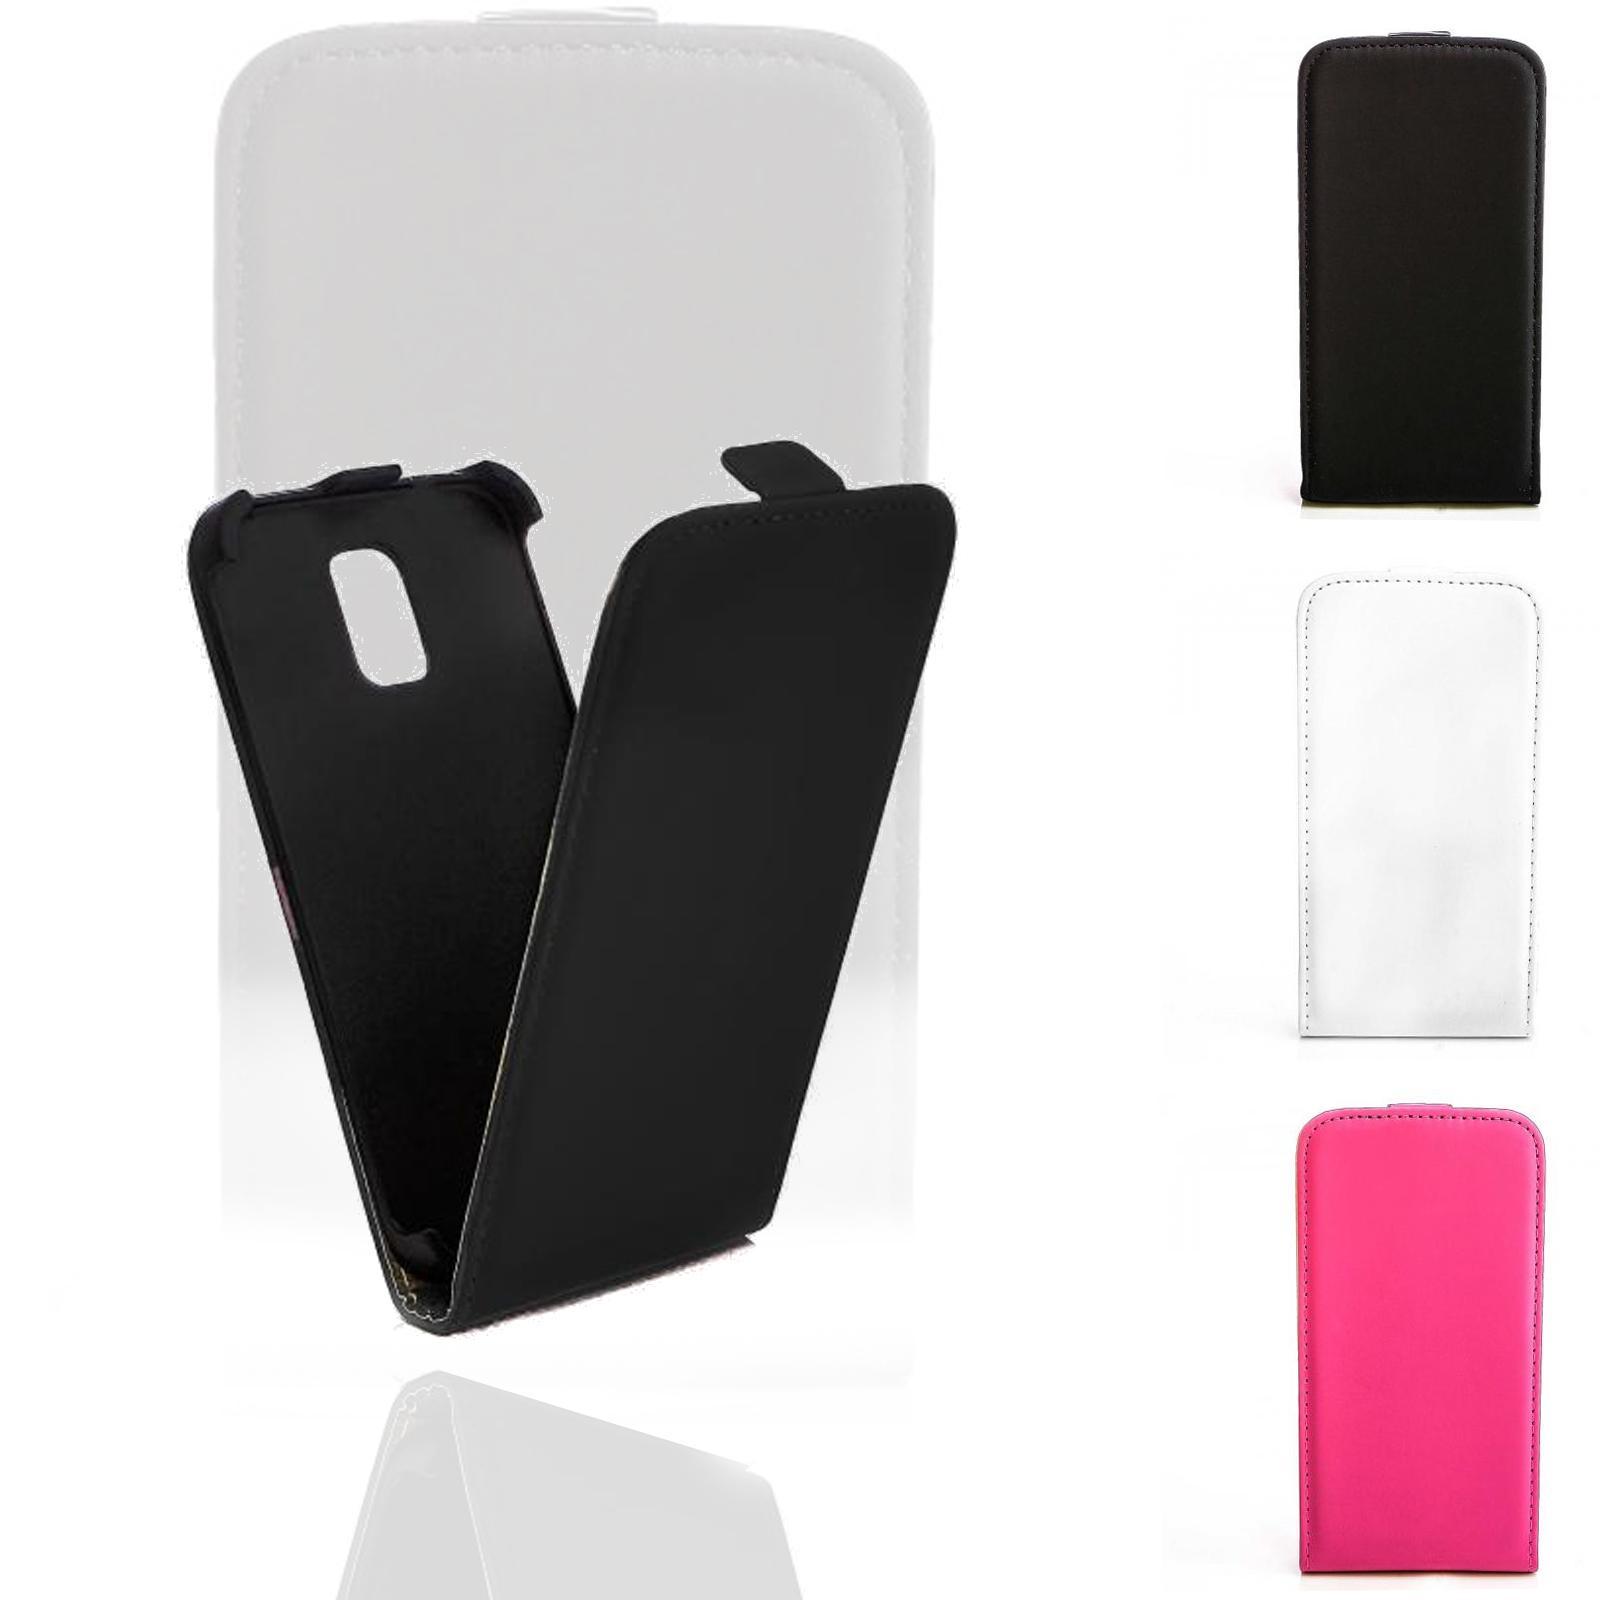 Flip-Case-Handy-Tasche-Schutz-Huelle-Klapp-Etui-Hard-Cover-Flipcover-Ober-Schale